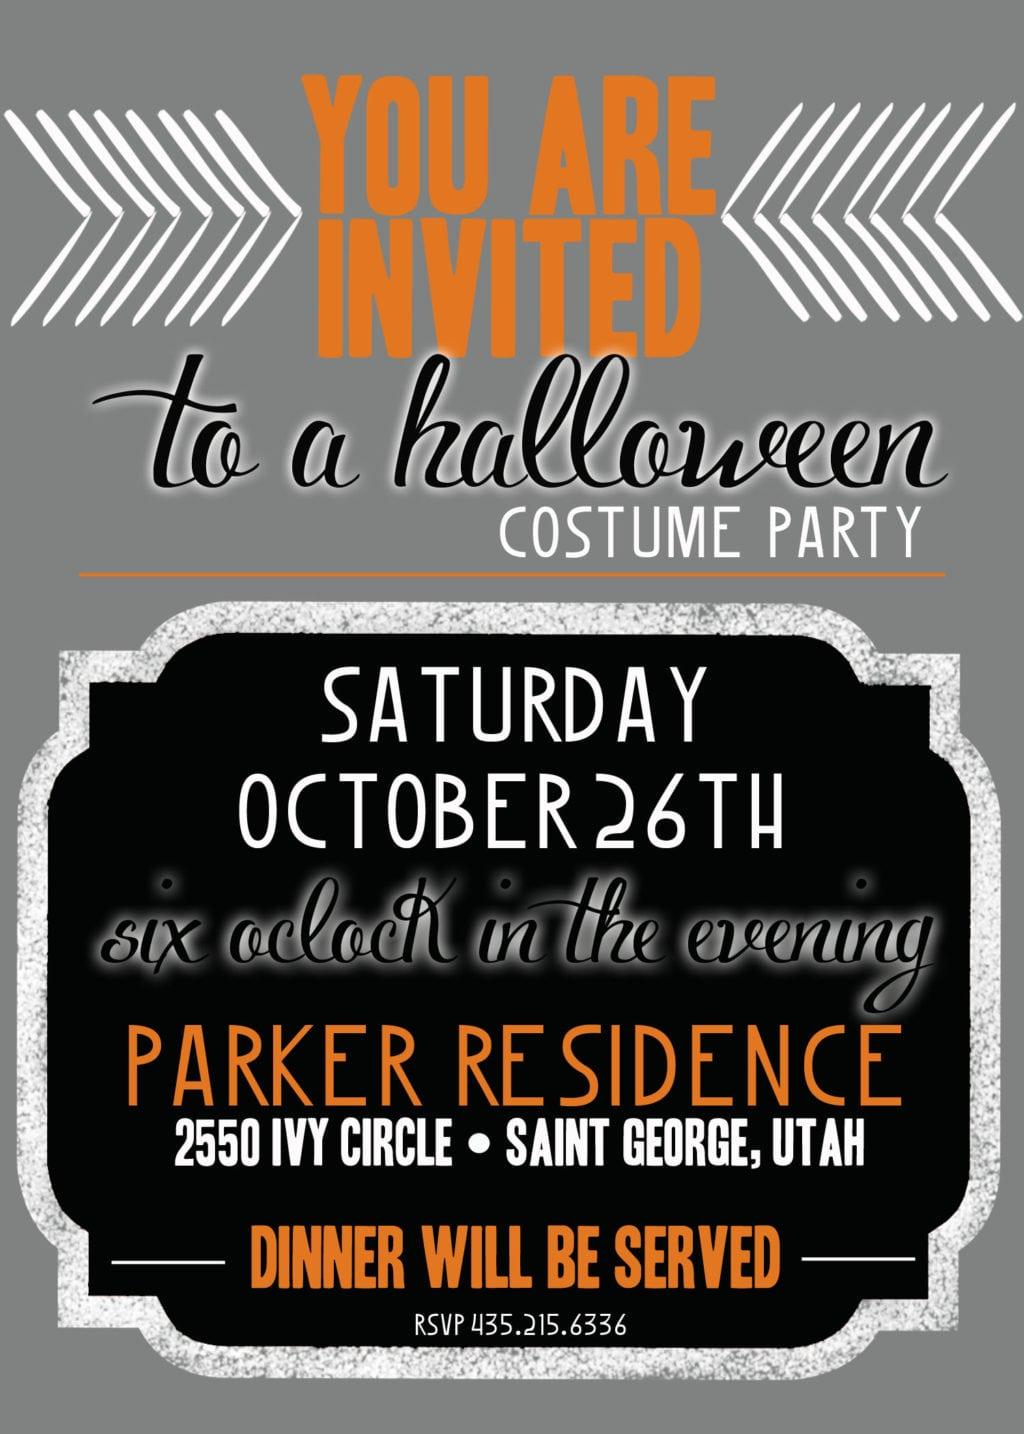 divine halloween party invitation costume wording free party – Free Printable Halloween Costume Party Invitations